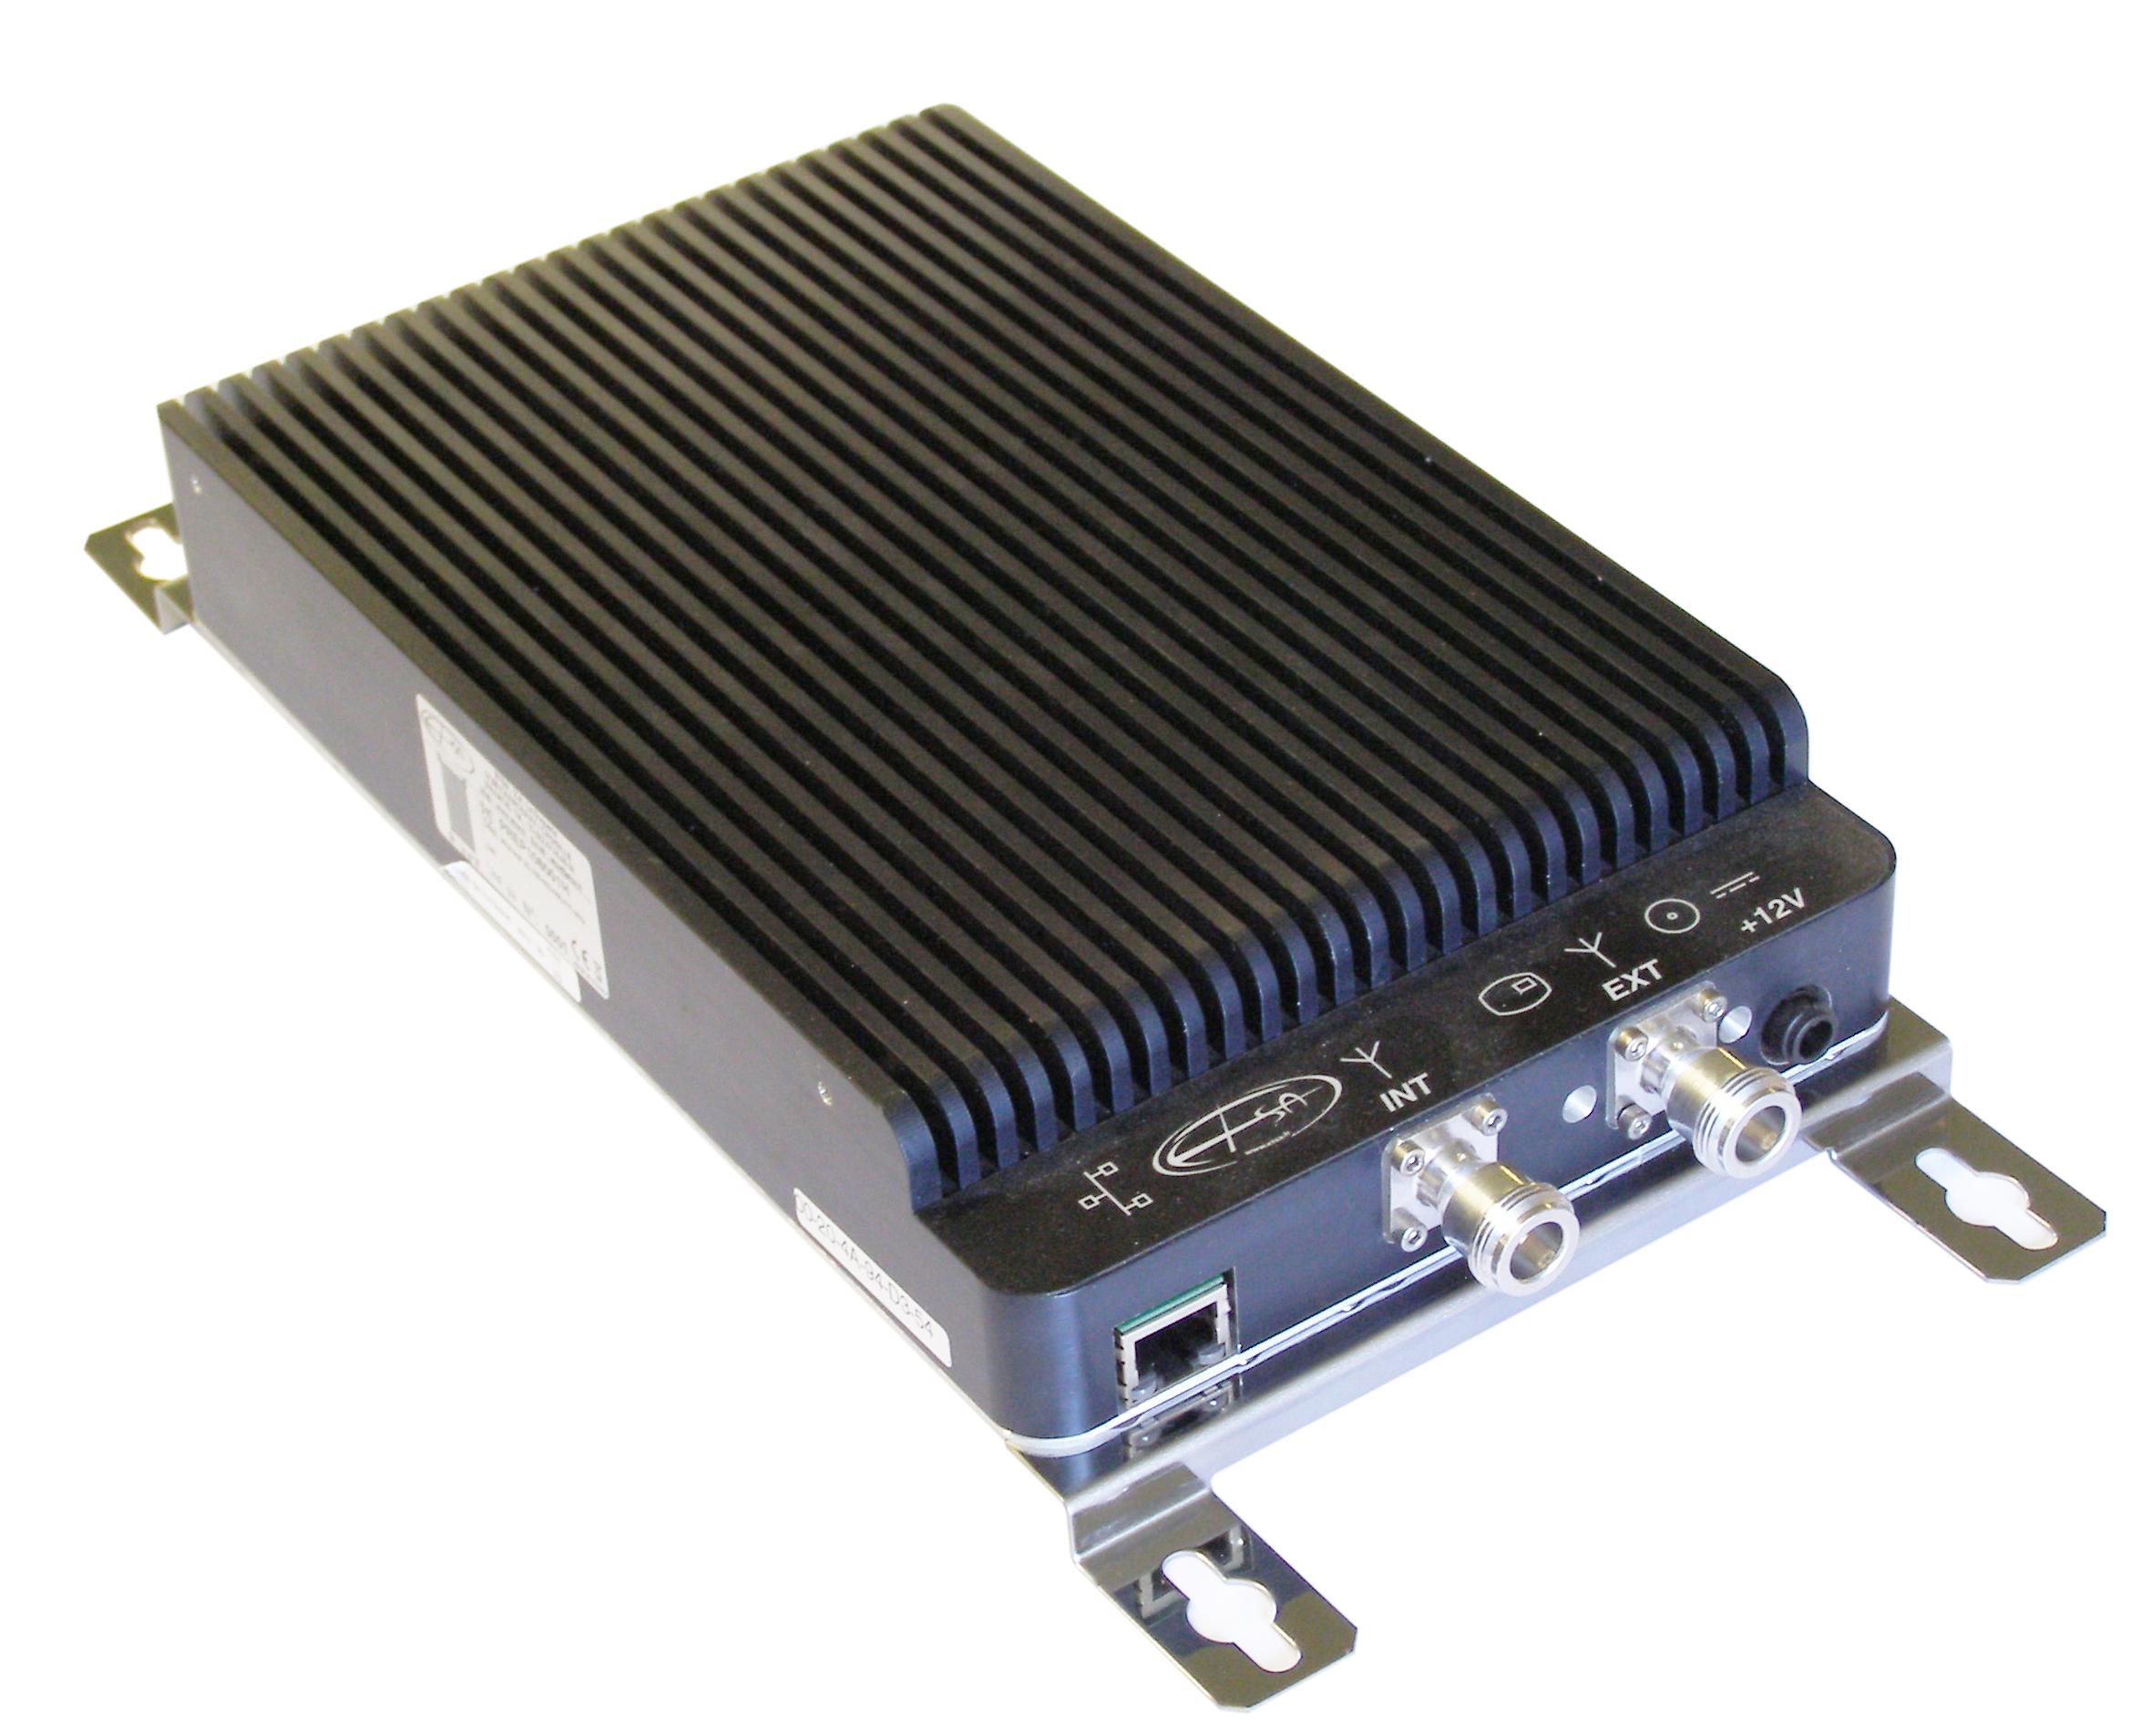 Ampliadors DMR-TETRA-GSM-LTE